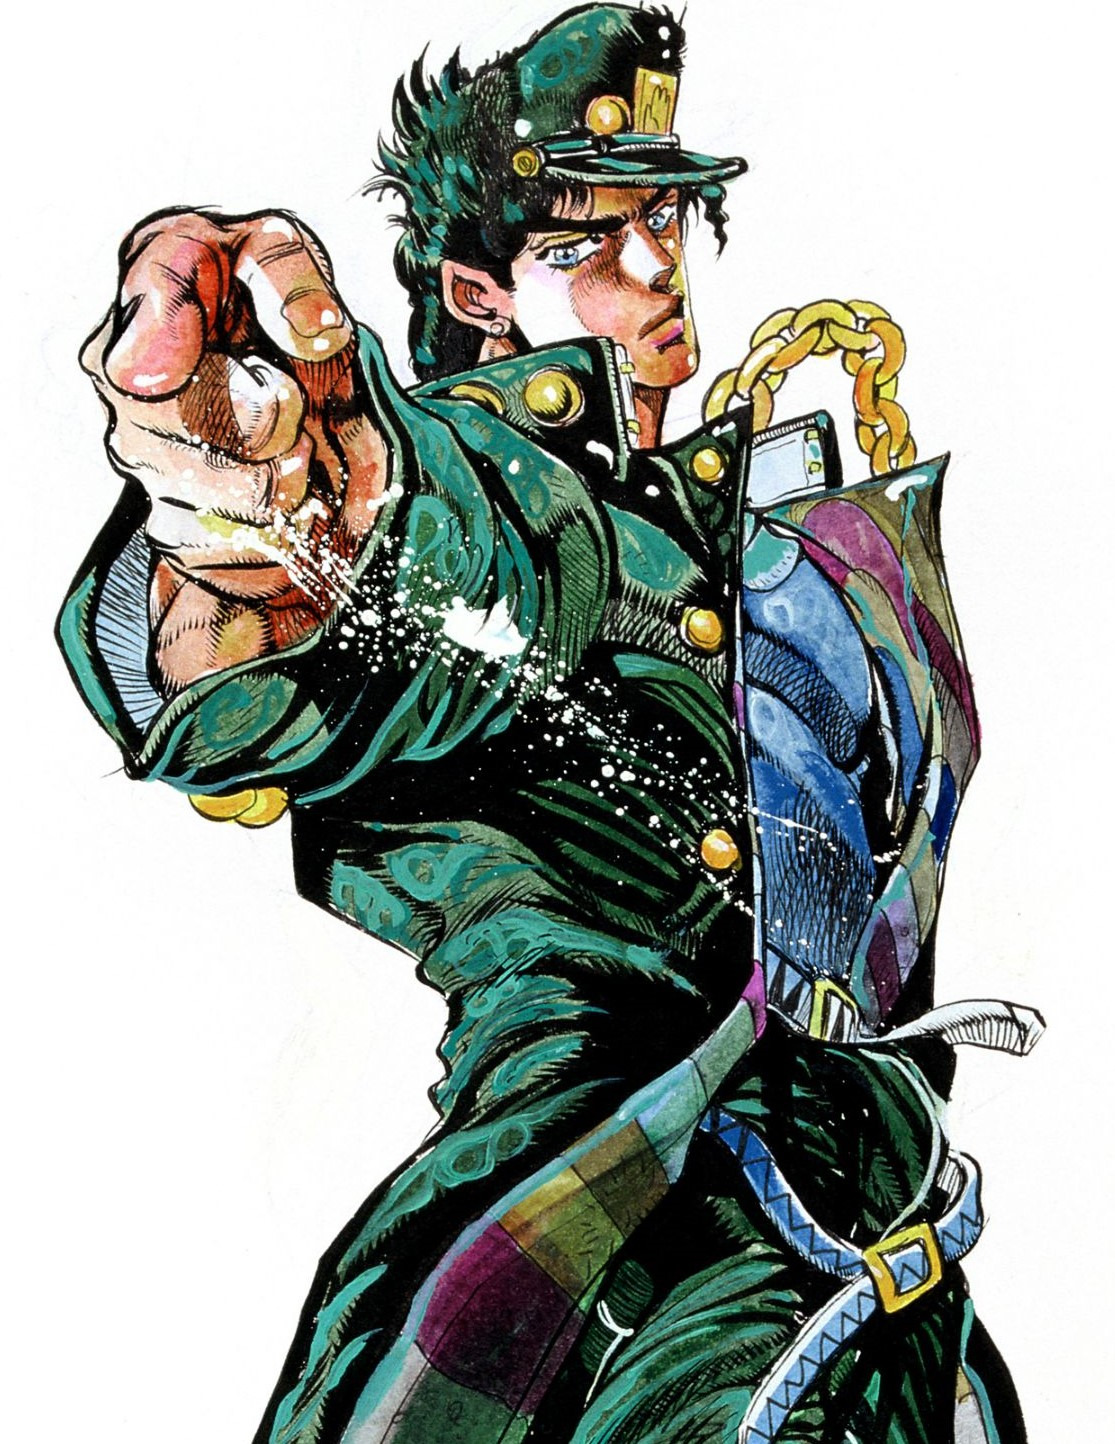 JoJo's Pose (menacing)